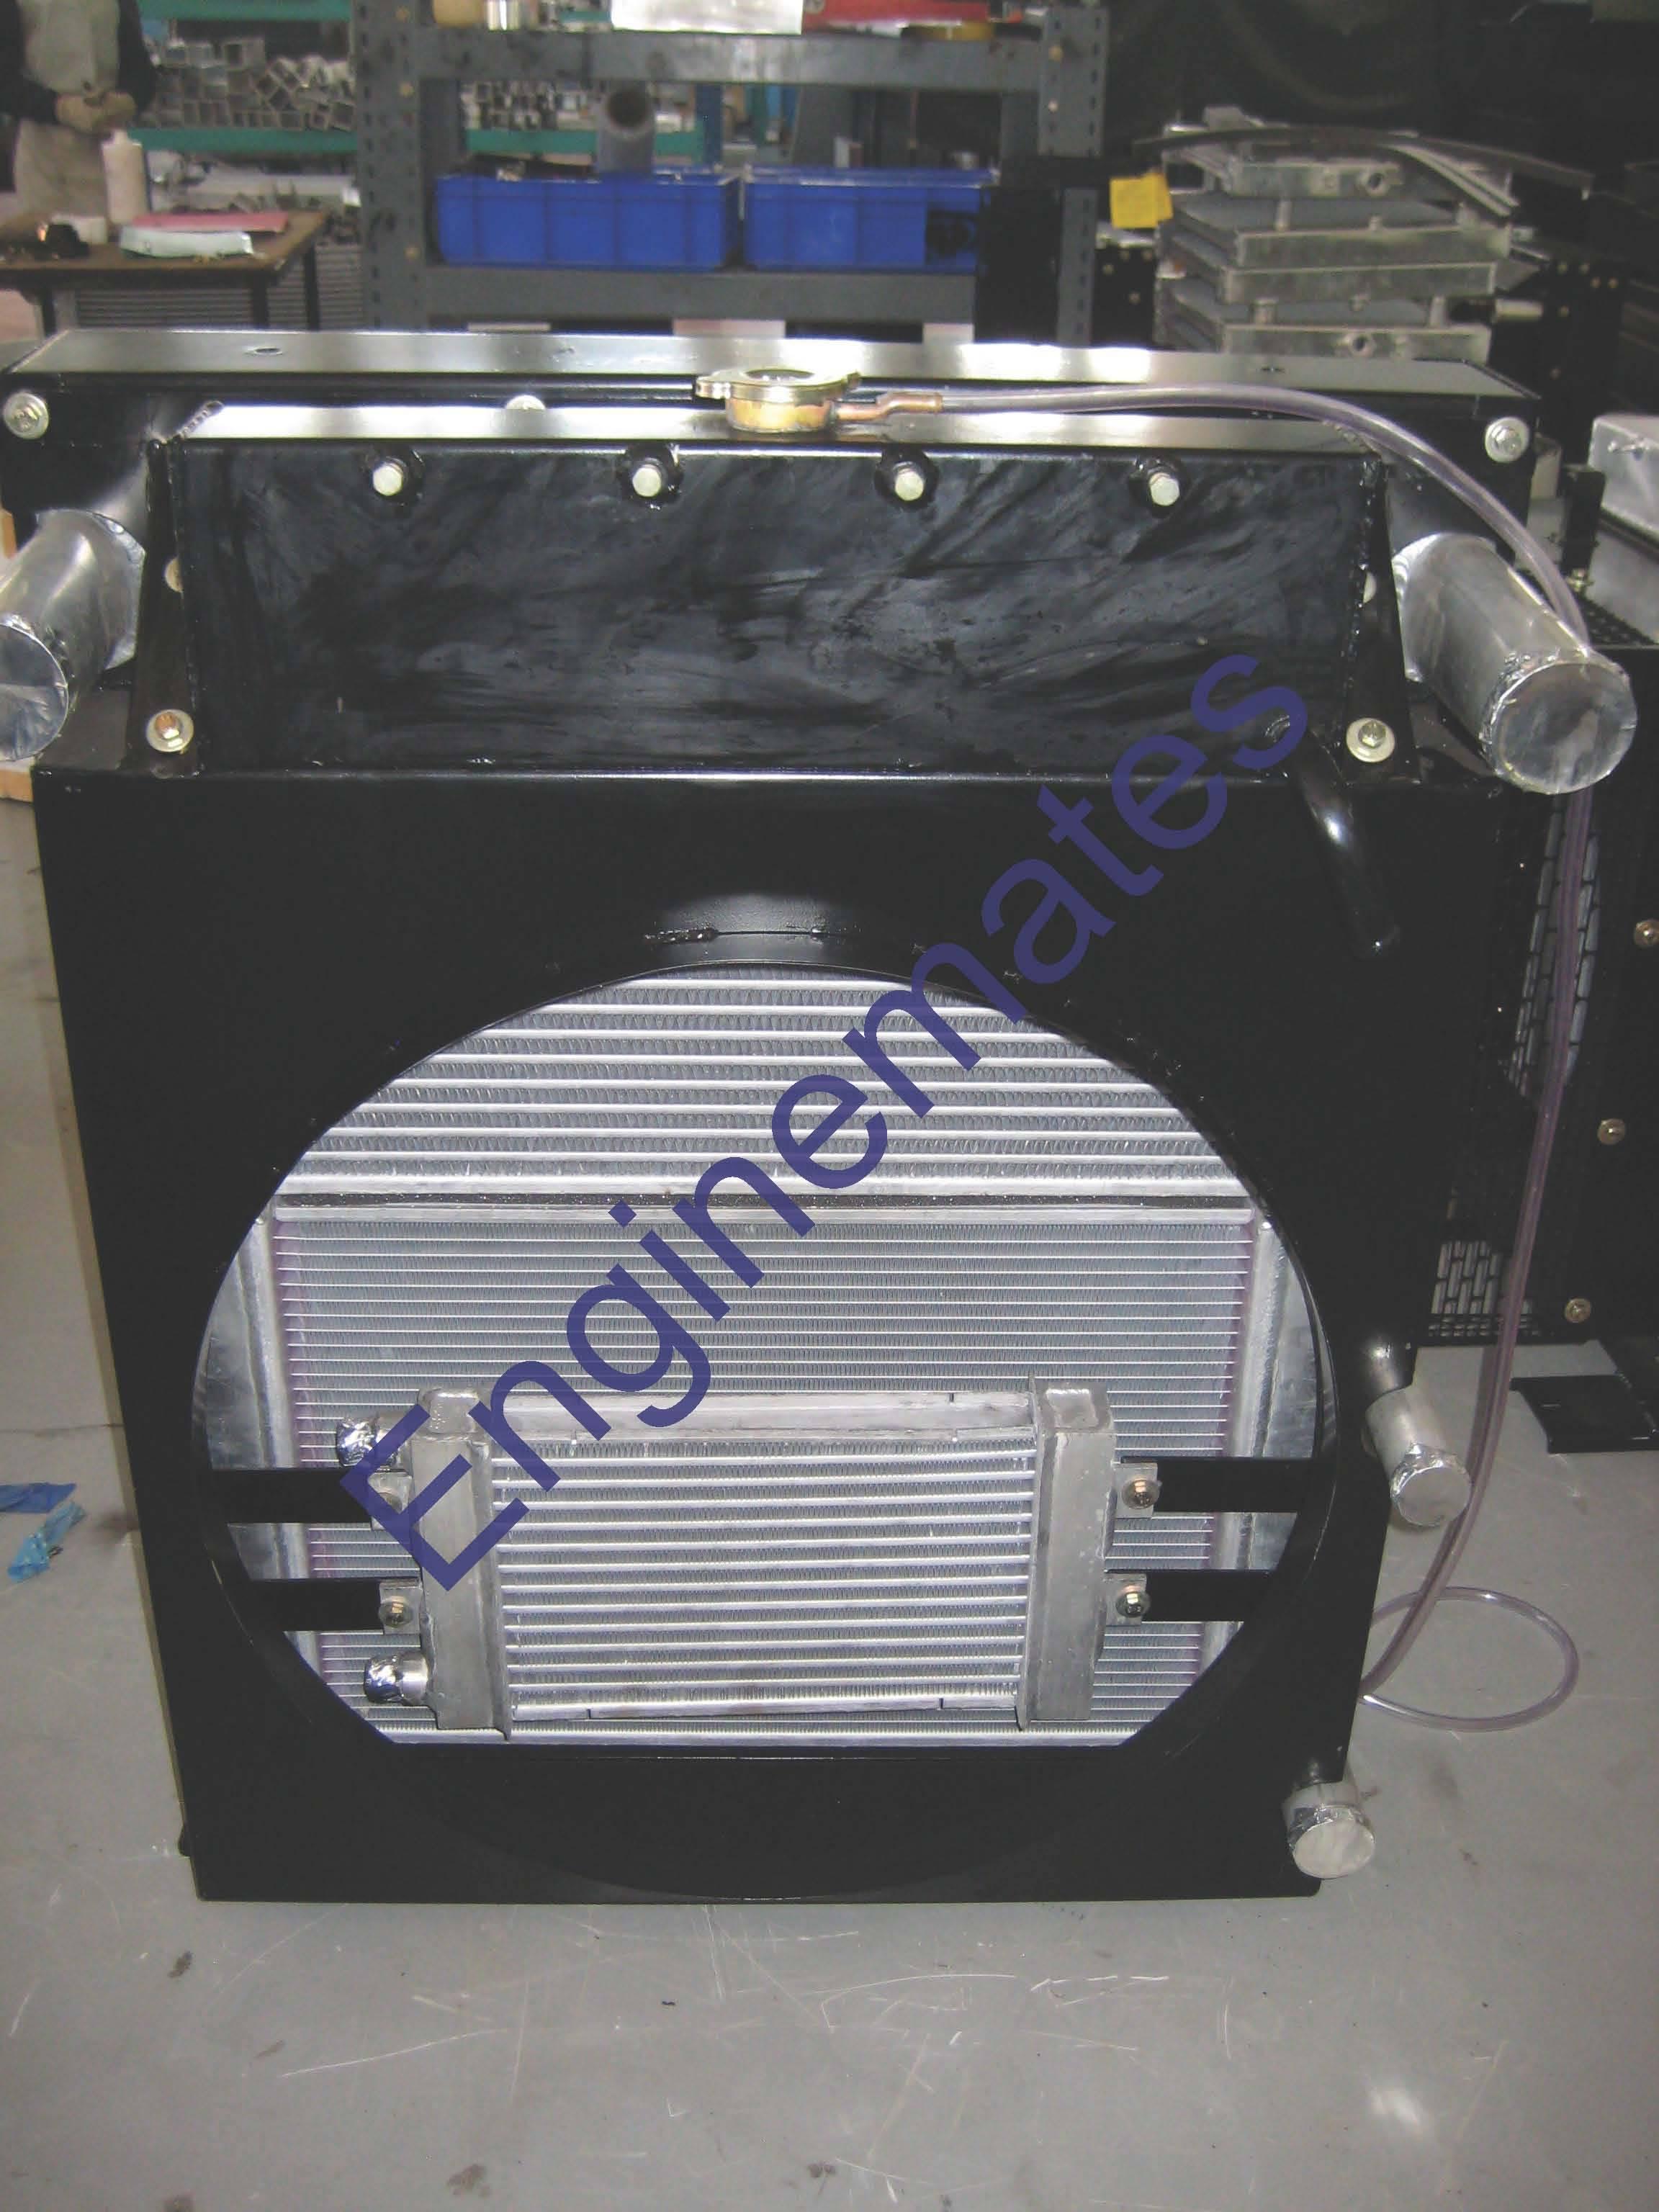 Radiator cum oil cooler assembly for fork lift